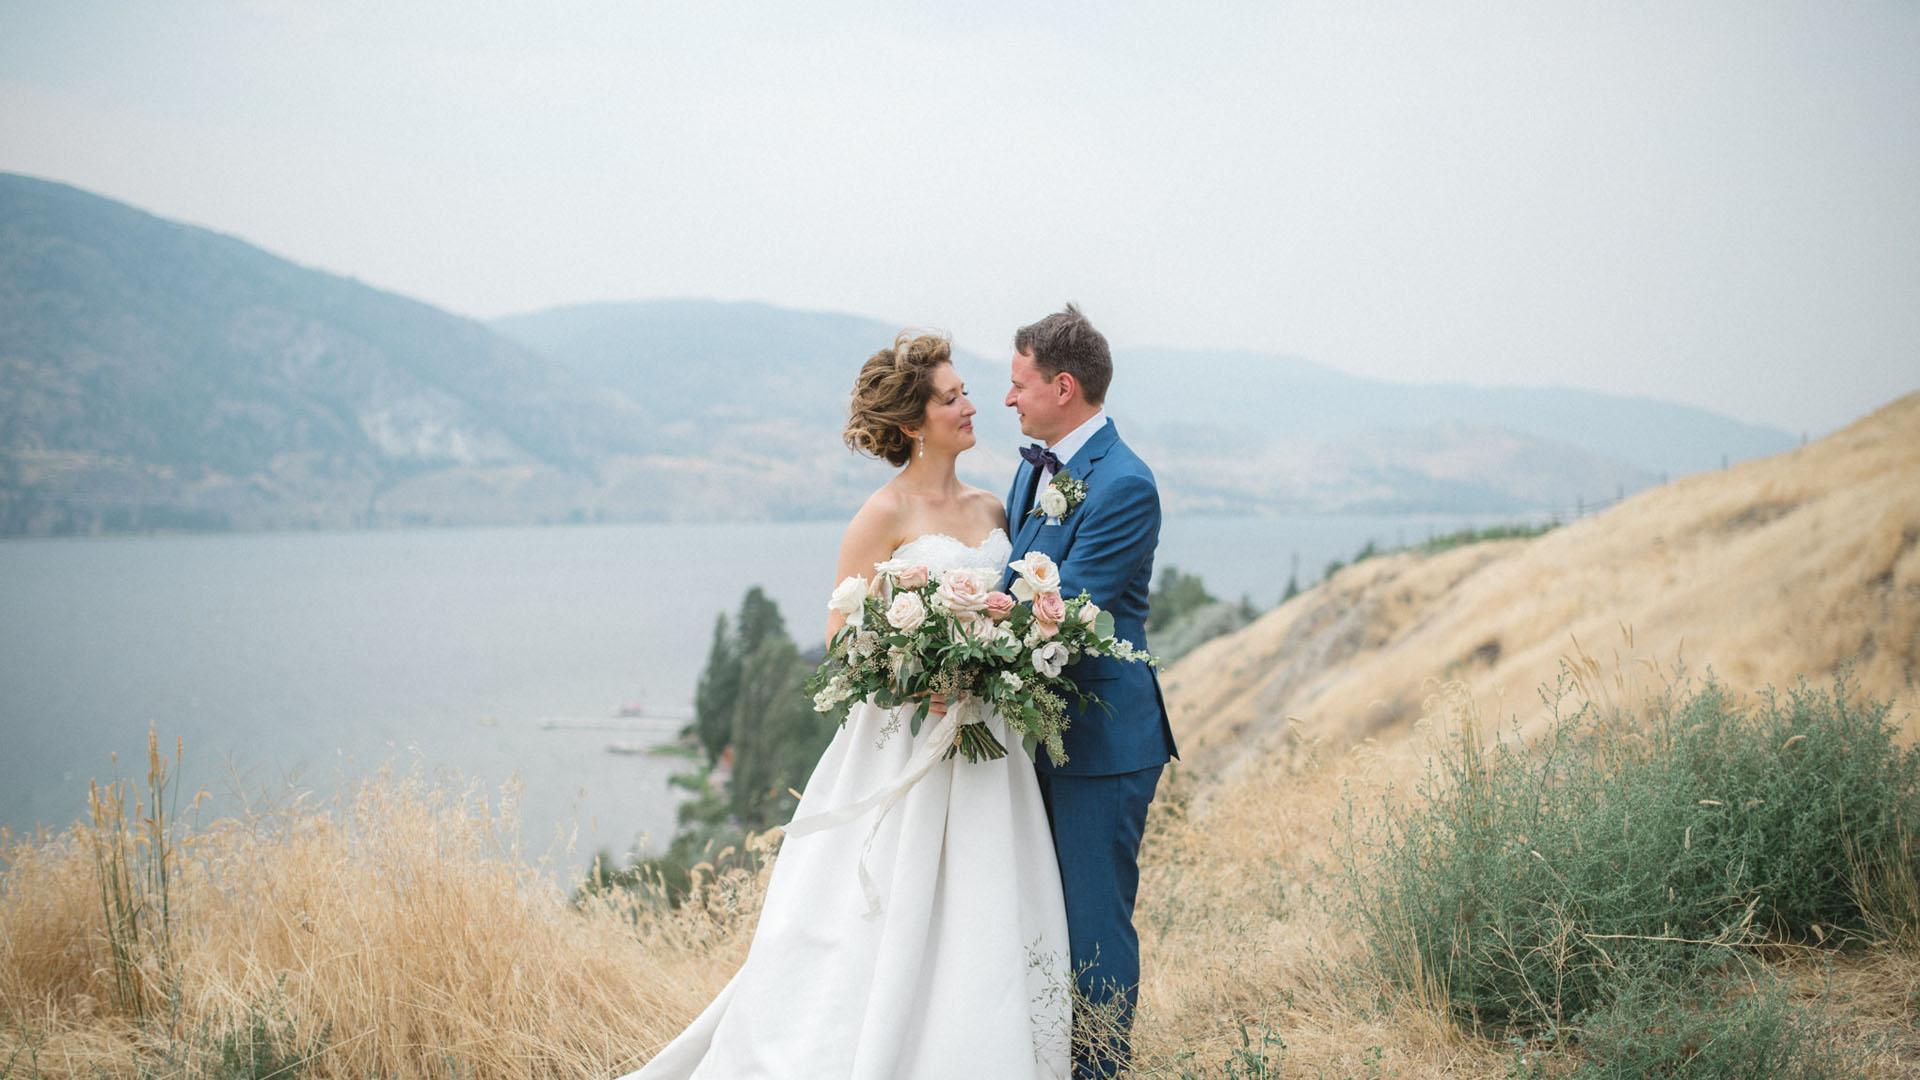 painted-rock-winery-wedding-penticton-videography-kismet-creative